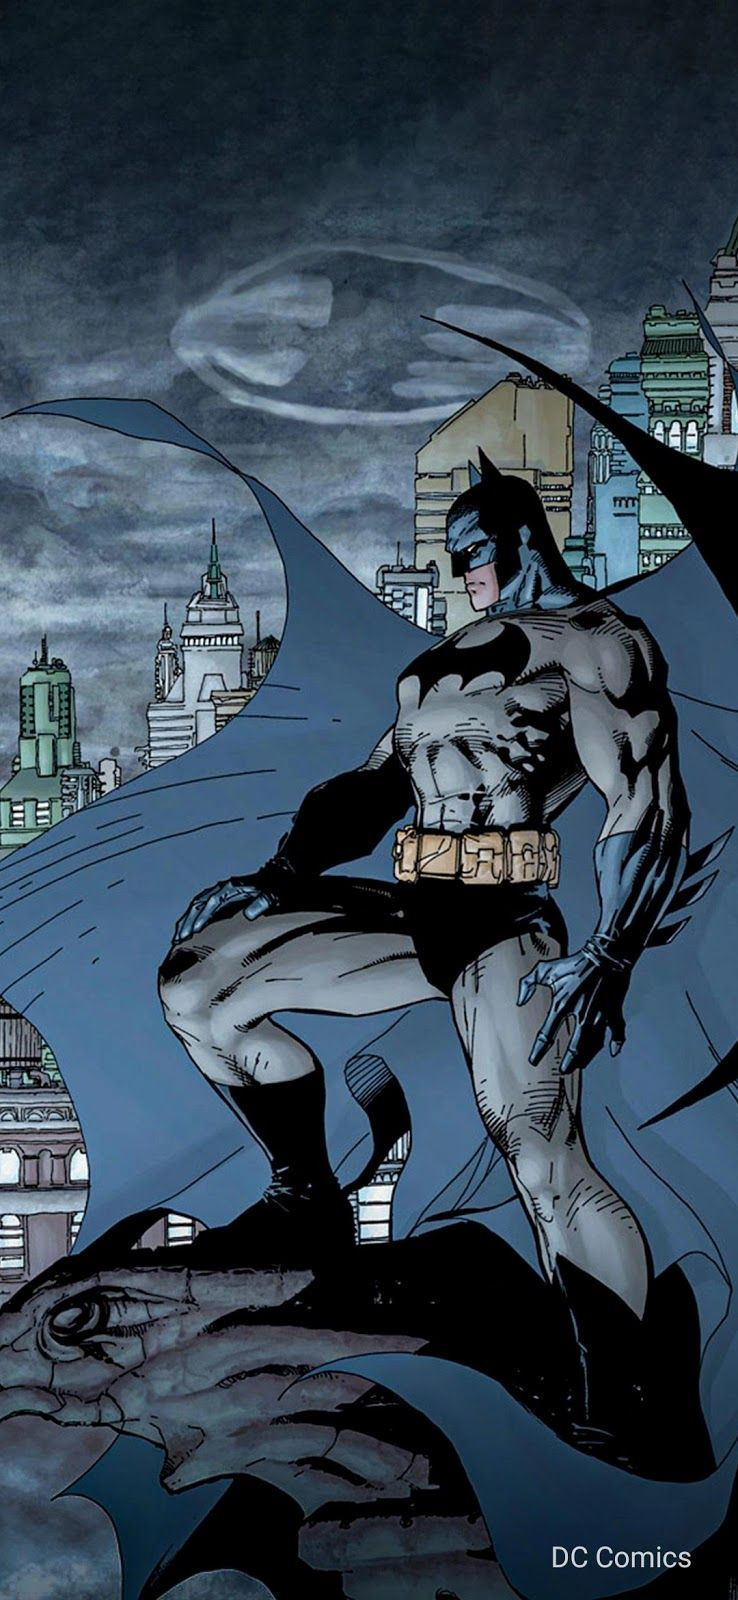 Best Wallpaper For Mobile Download Batman Comic Wallpaper Batman Artwork Dc Comics Wallpaper Iphone